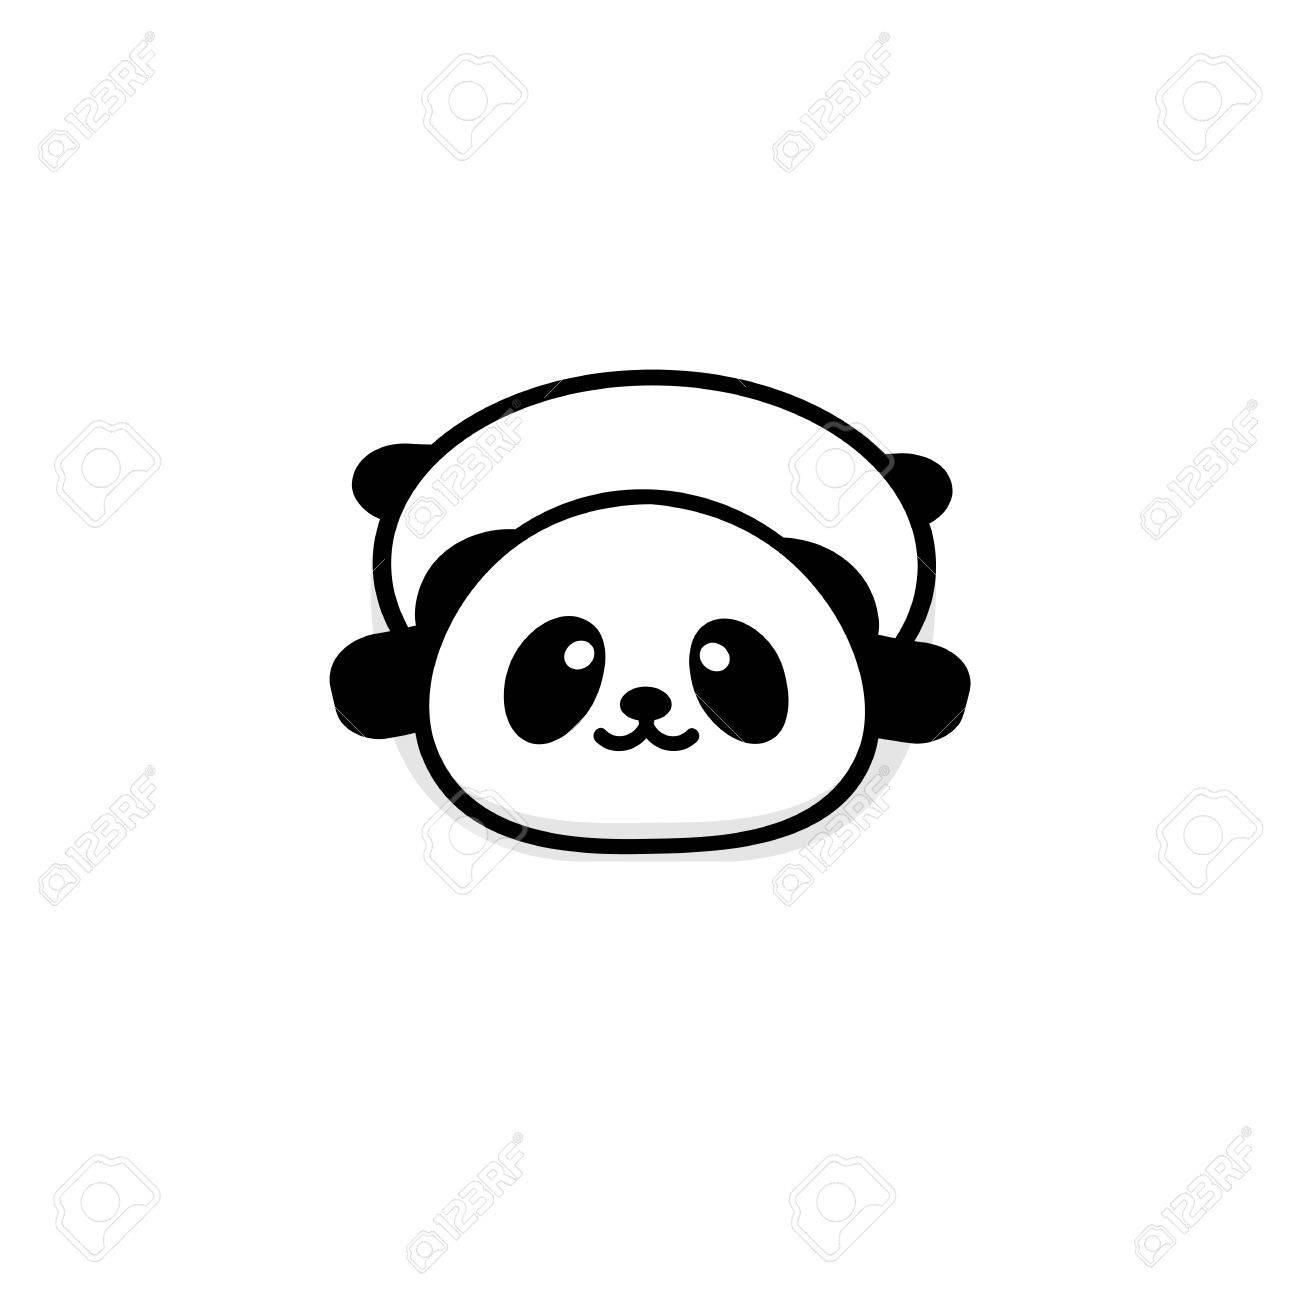 Dessin Du Panda Kreslená